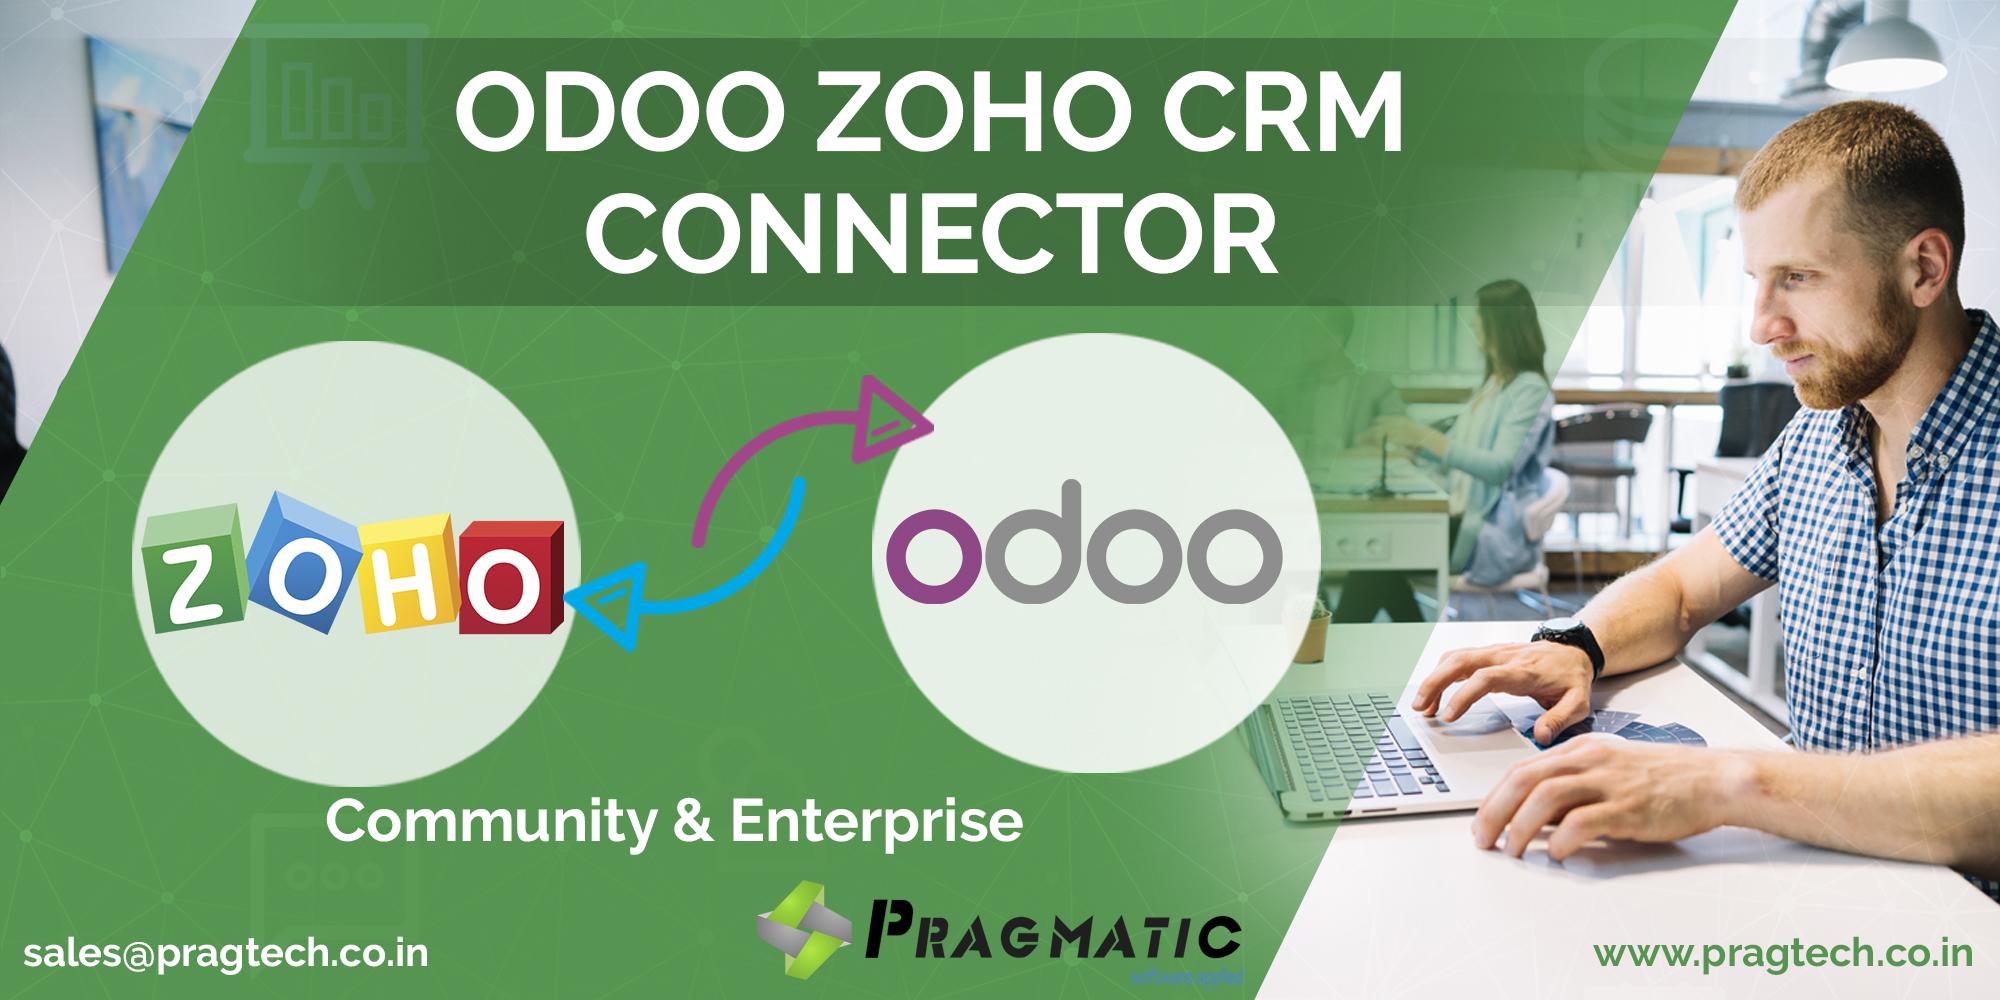 Pragmatic Odoo Zoho CRM Connector